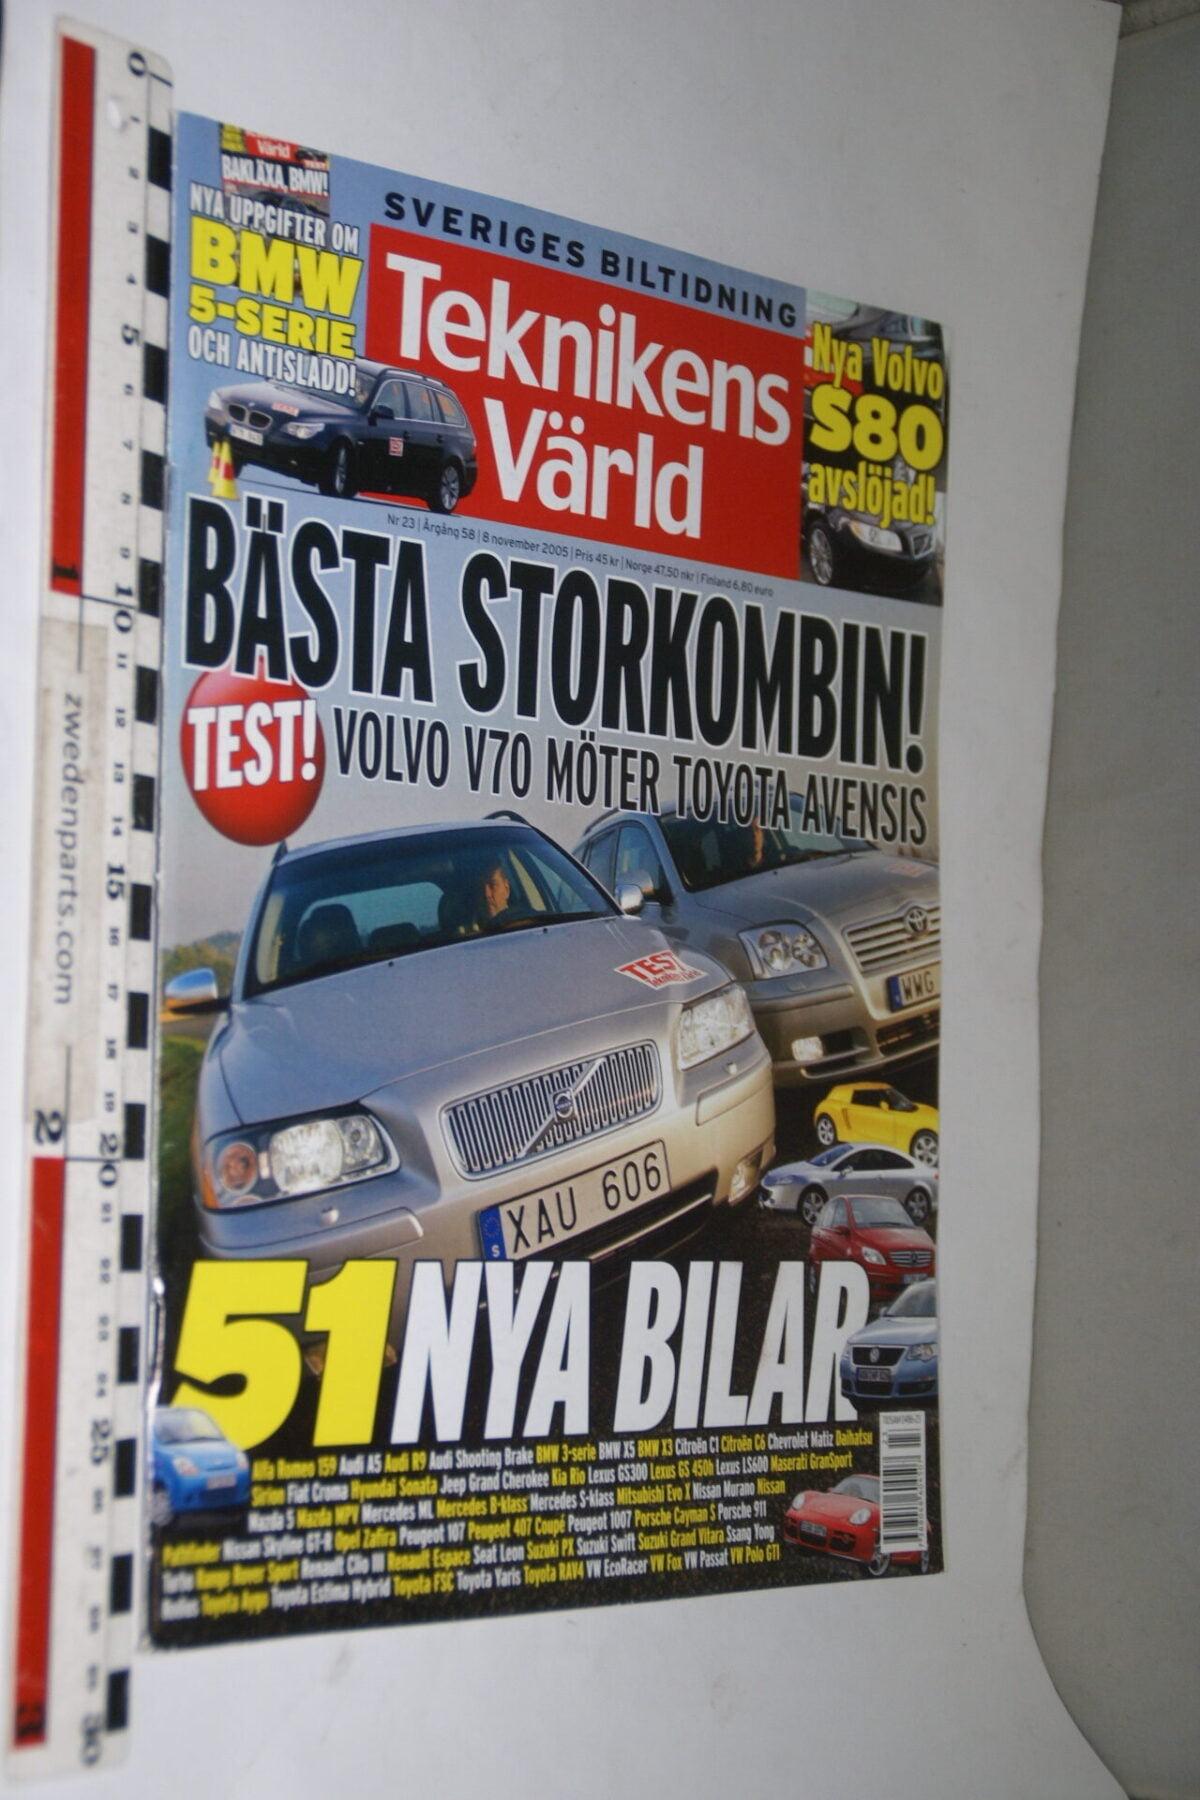 DSC08069 tijdschrift Teknikens Värld met nieuwe Volvo S80 8 november 2005, Svenska-2359e6ed